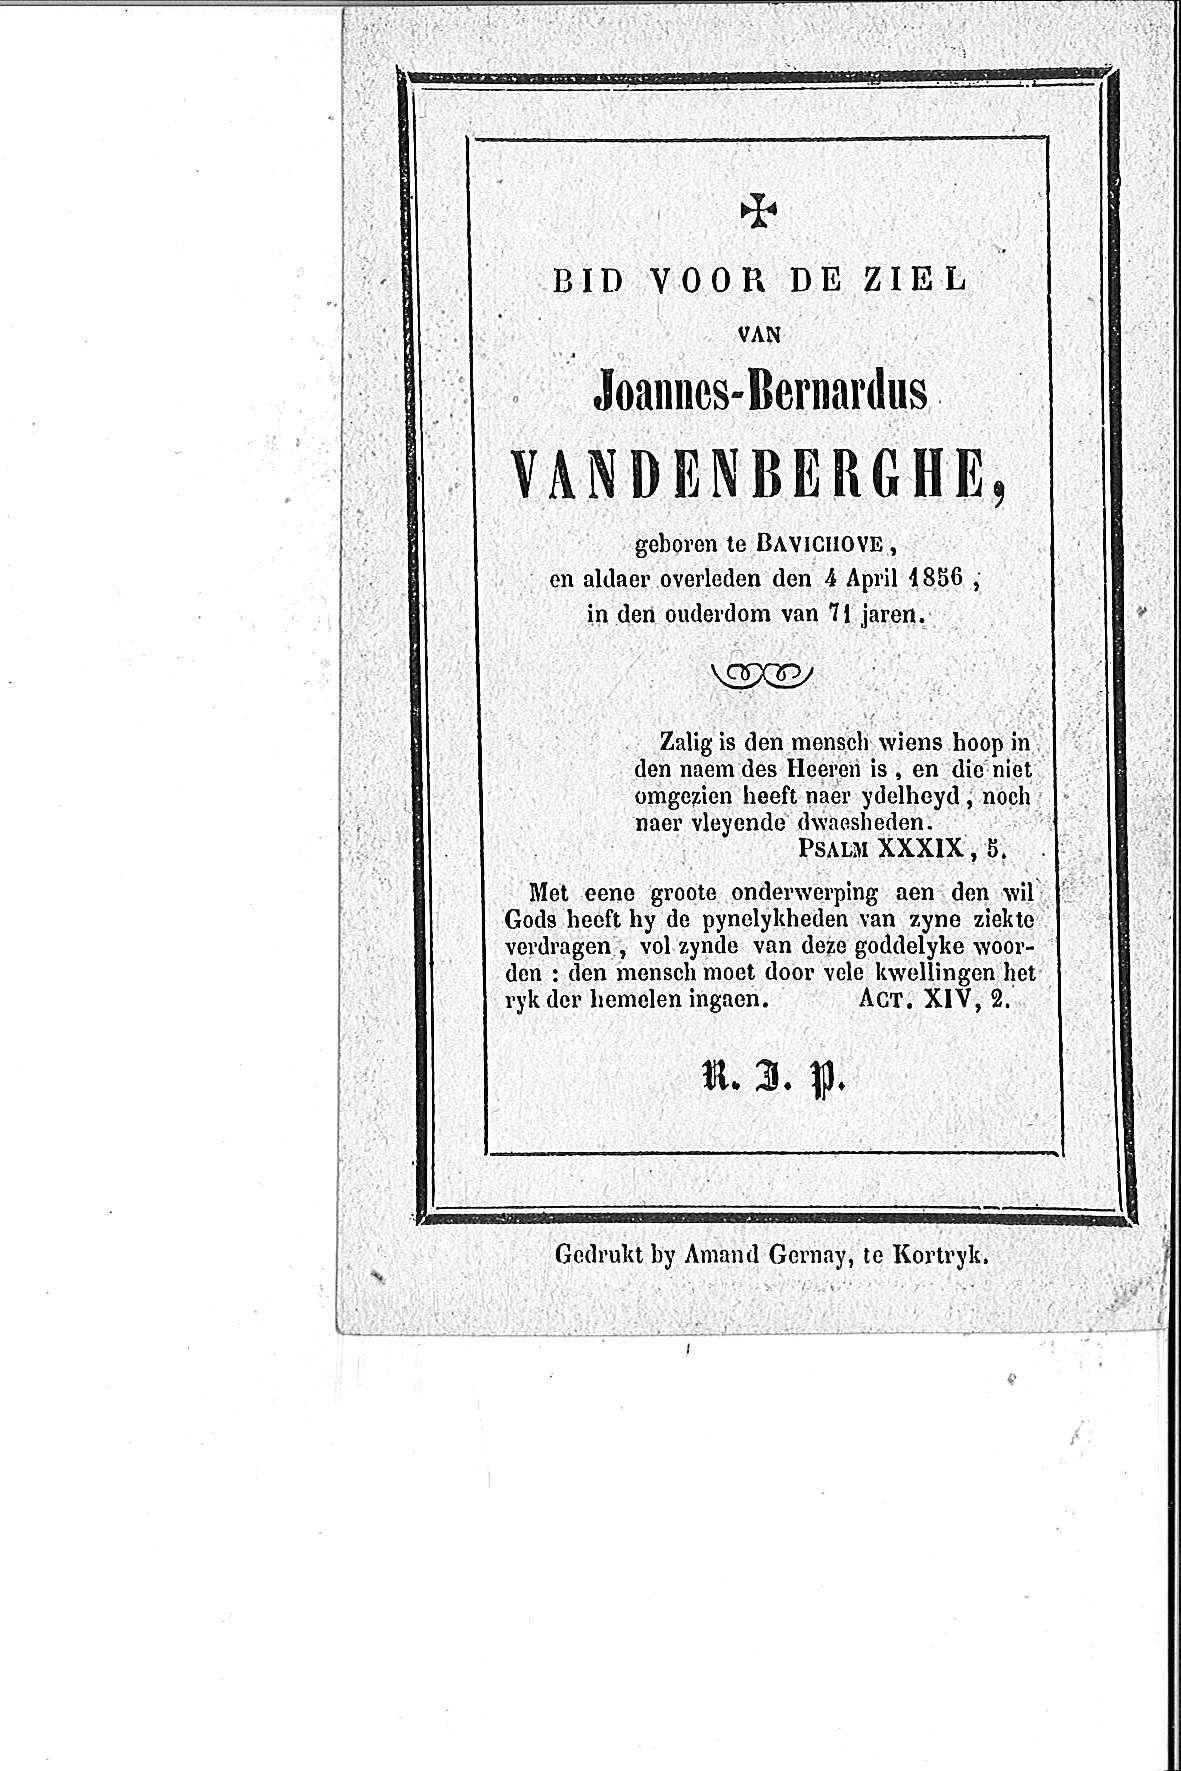 Joannes_Bernardus(1856)20150730131418_00090.jpg